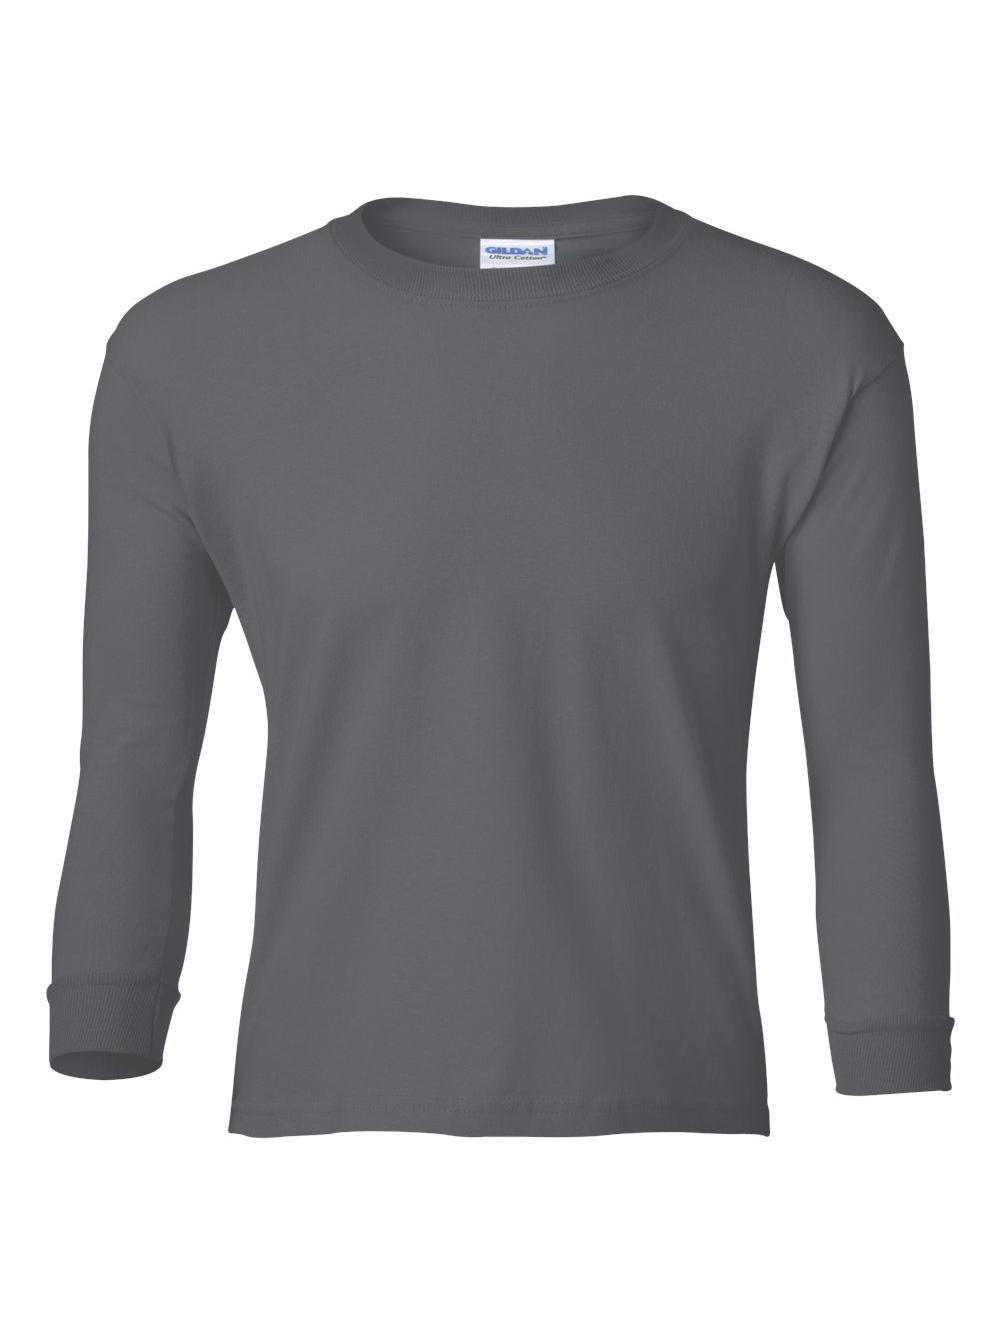 Gildan-Ultra-Cotton-Youth-Long-Sleeve-T-Shirt-2400B thumbnail 9